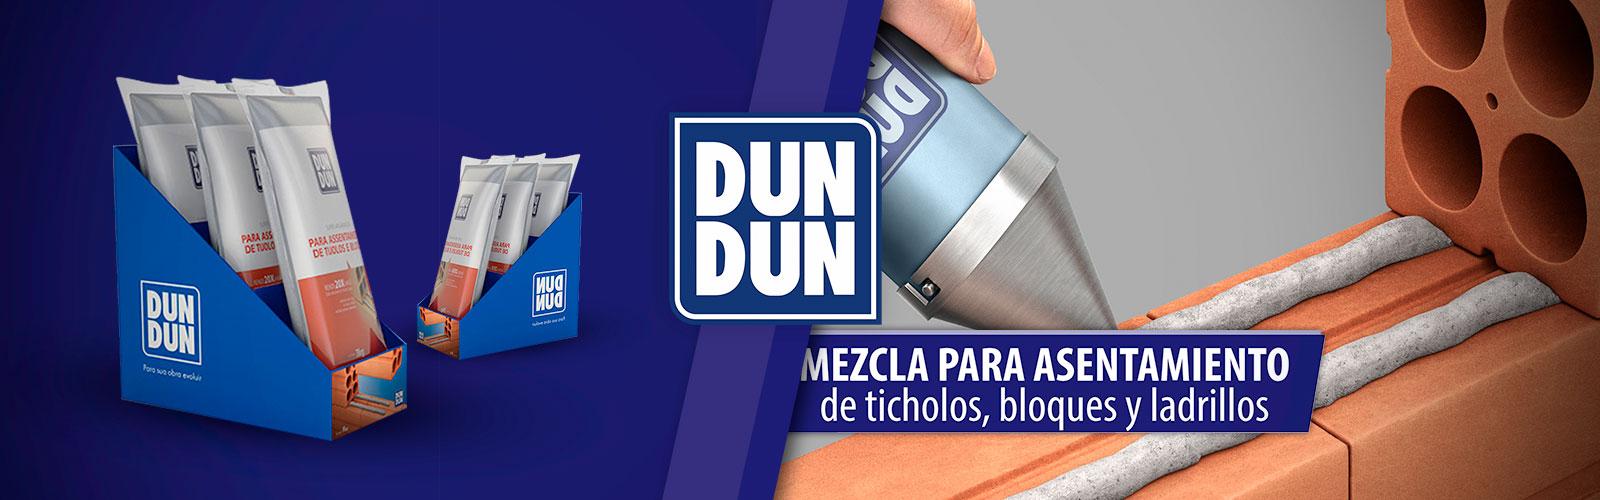 slide_dun_dun